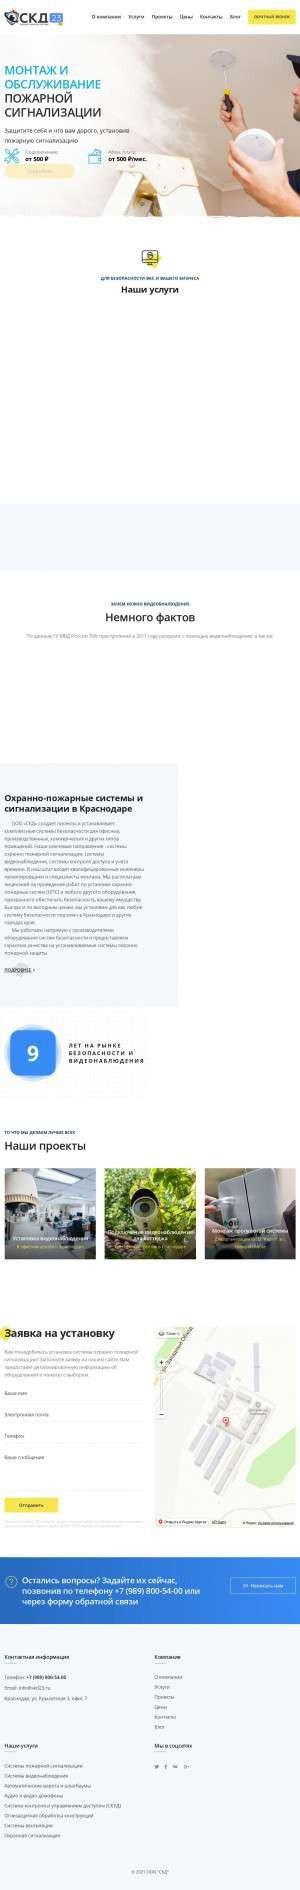 Предпросмотр для skd23.ru — СКД